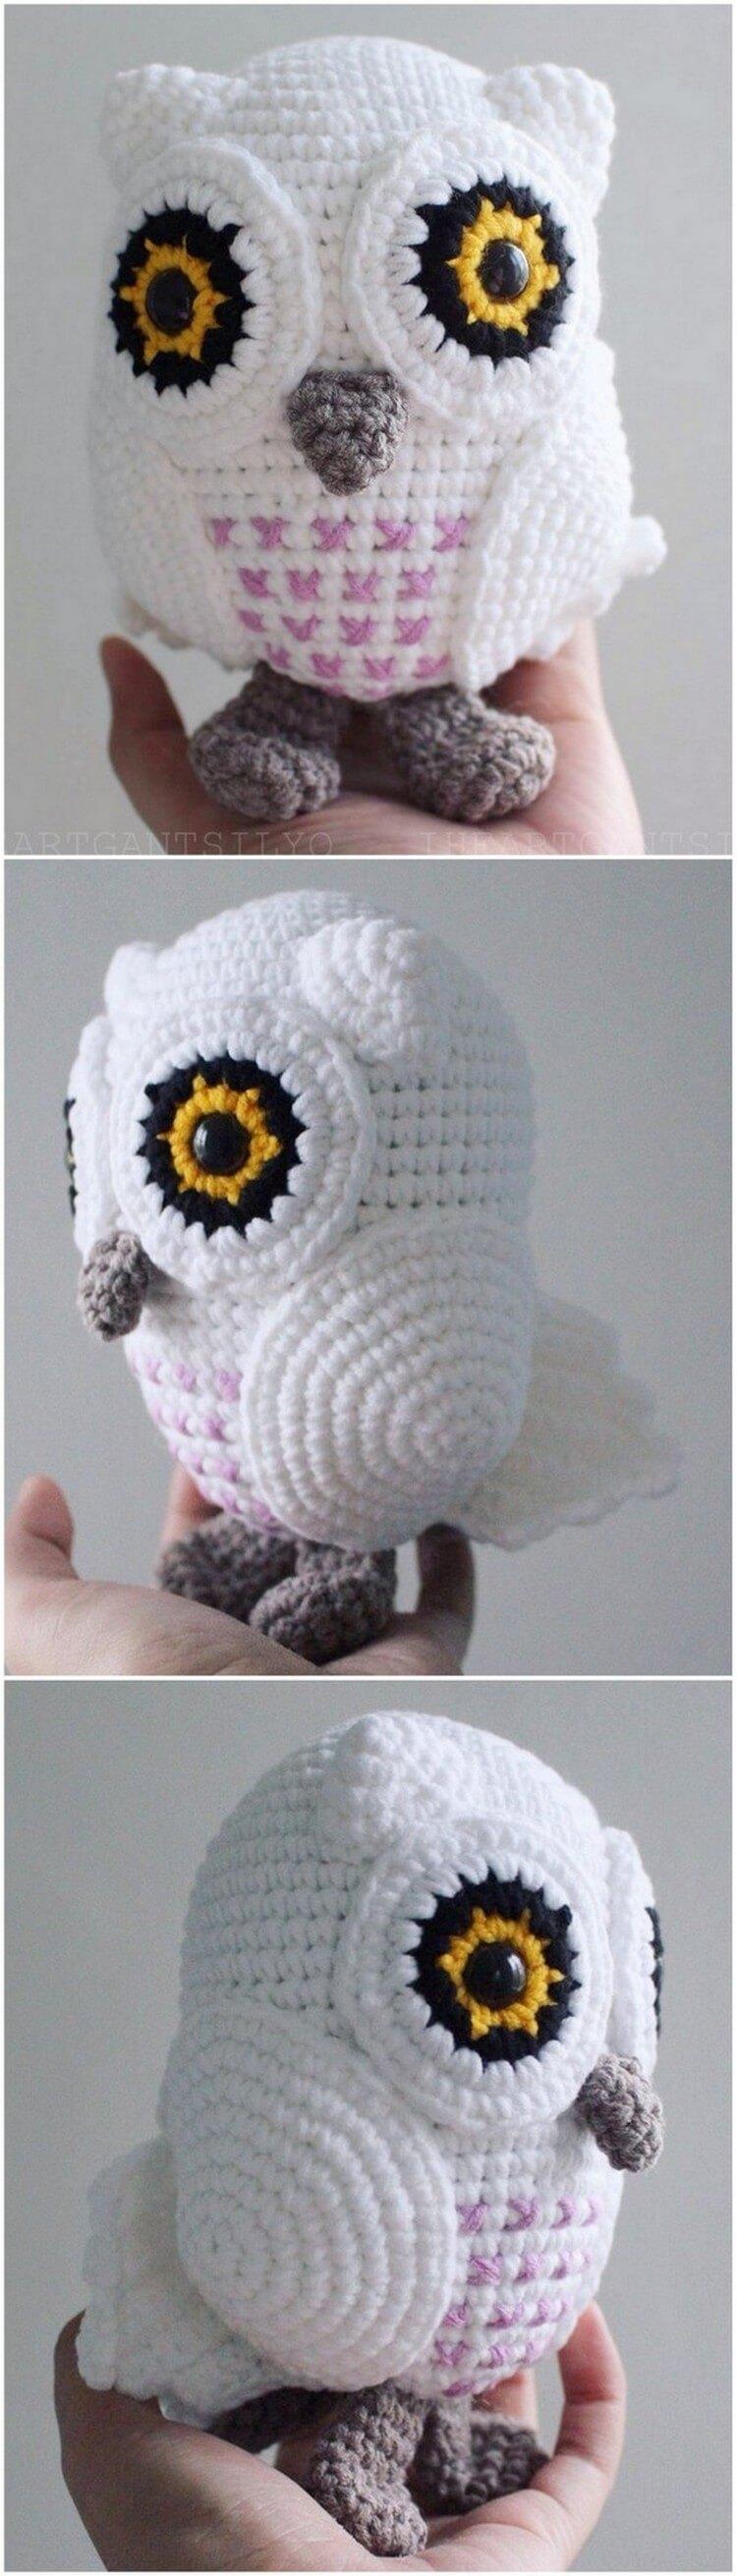 Crochet Amigurumi Pattern (2)